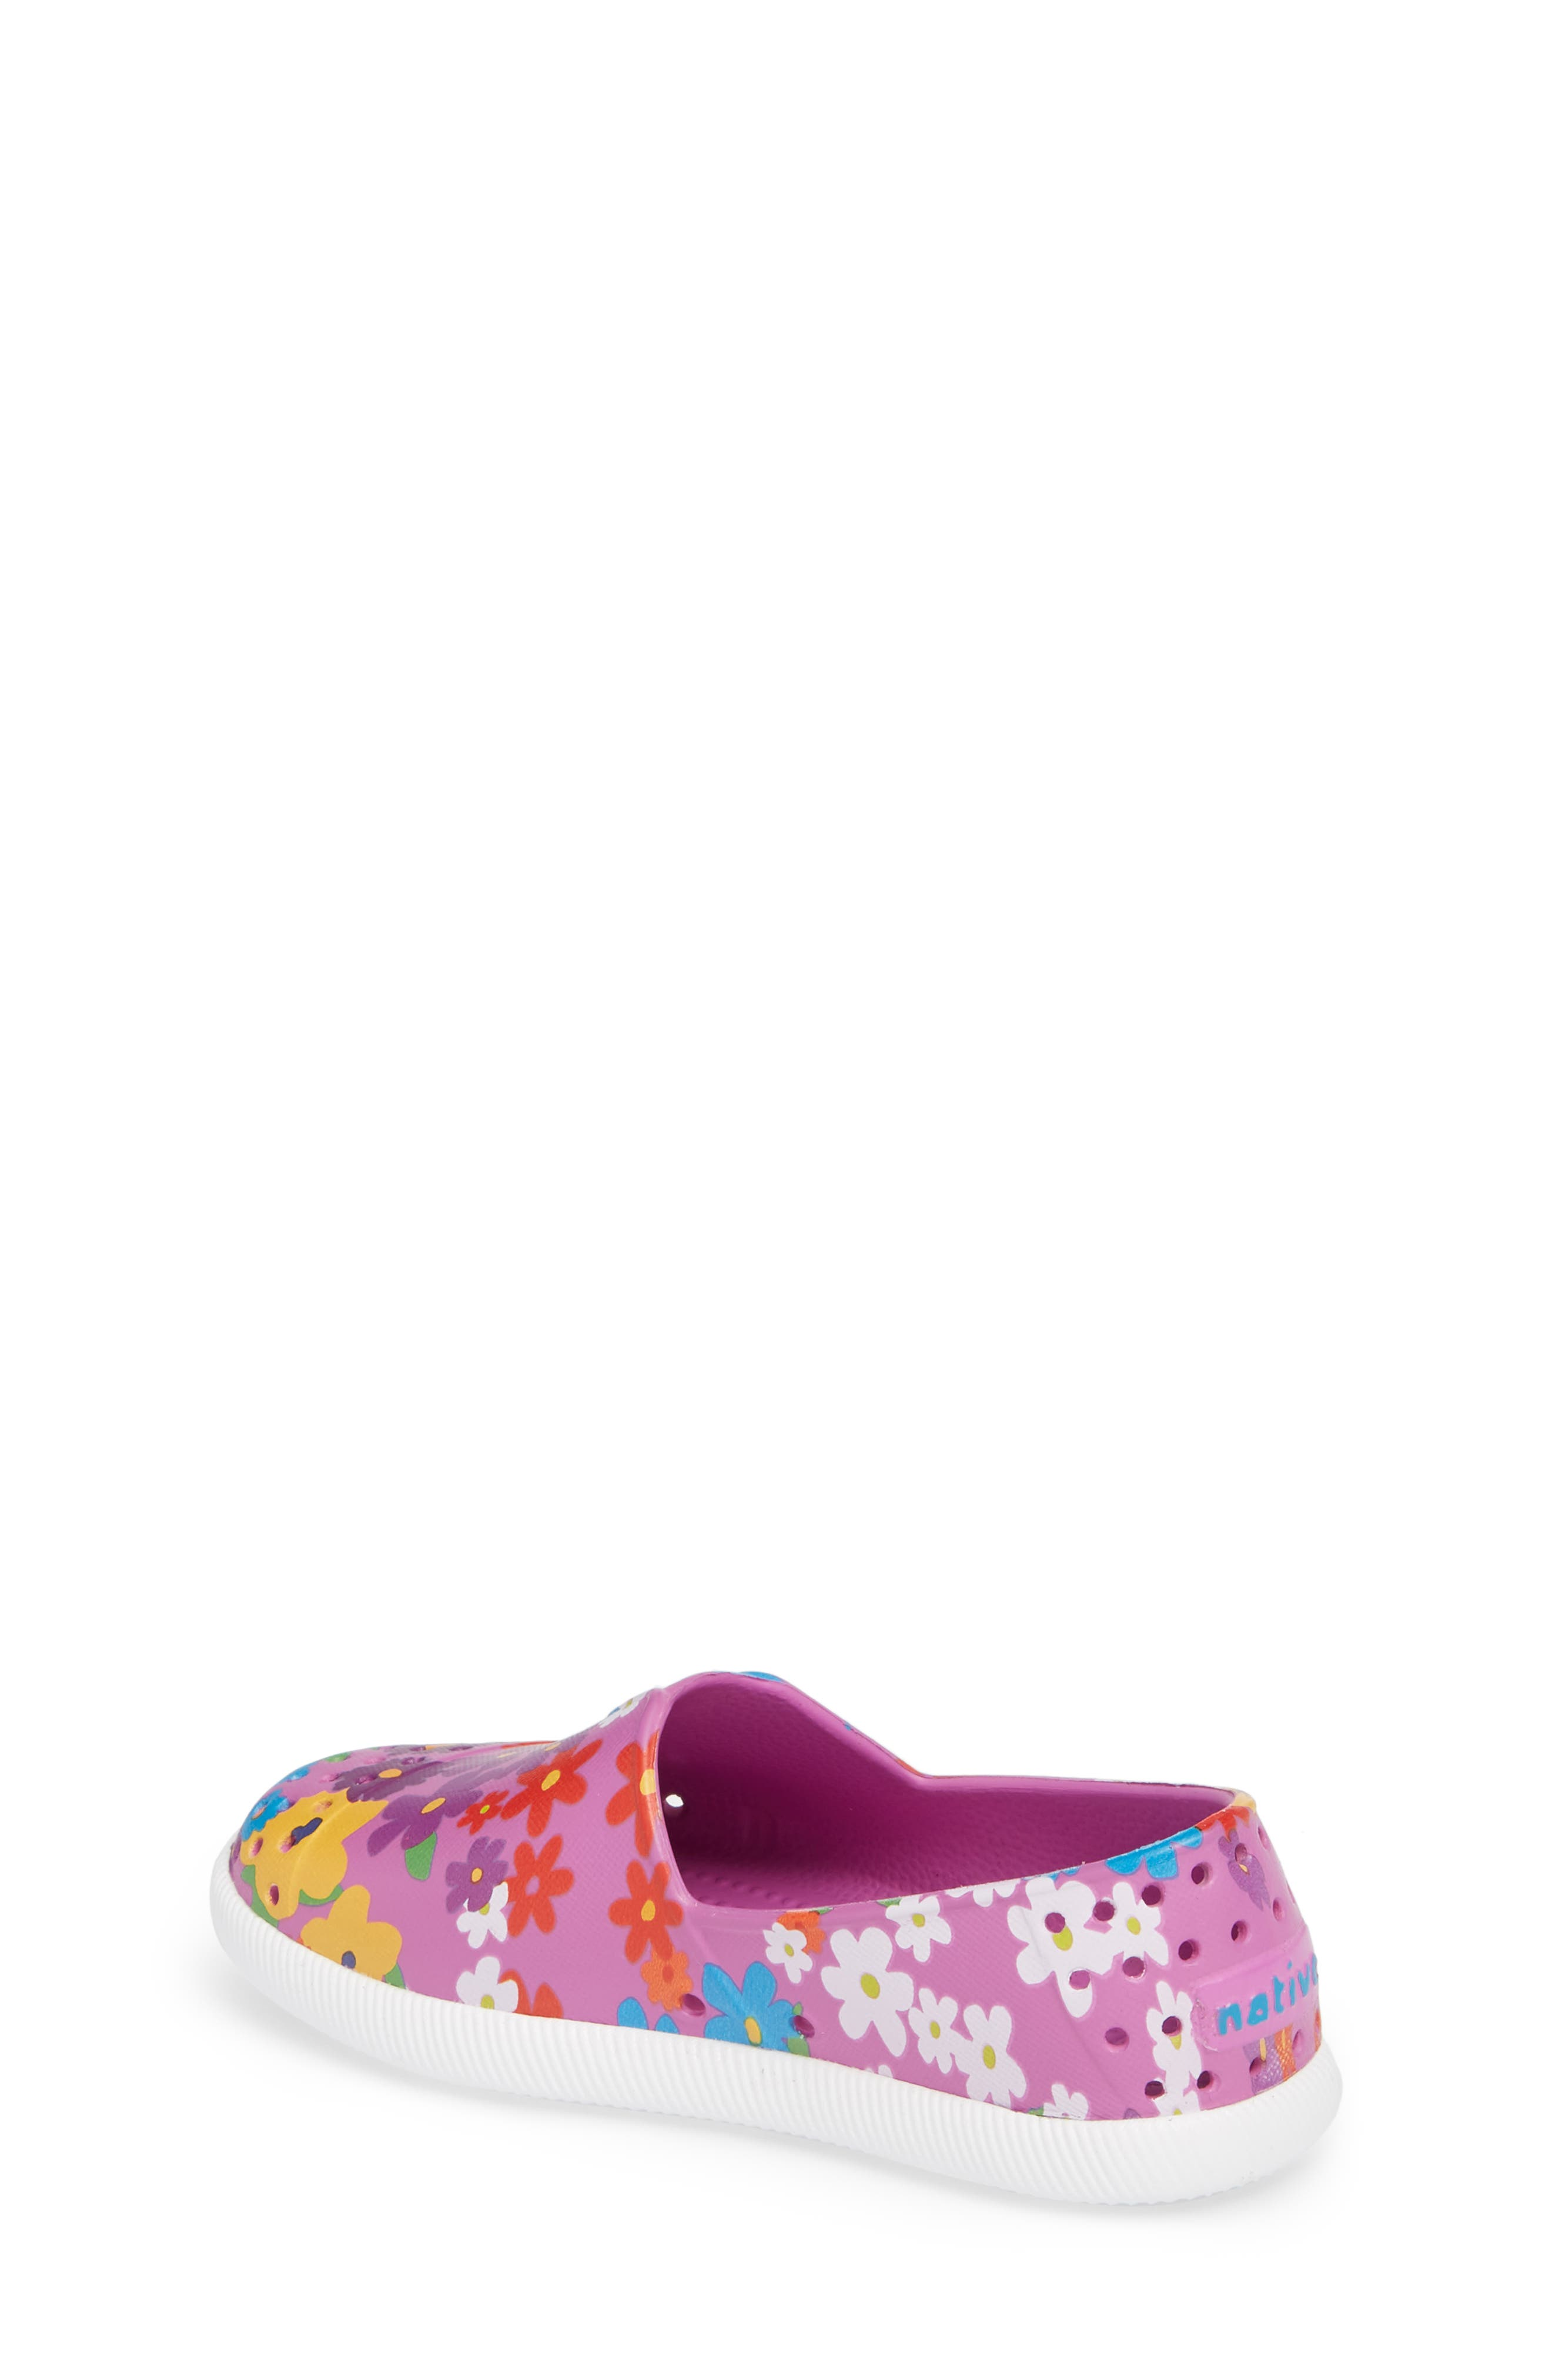 Verona Perforated Slip-On,                             Alternate thumbnail 2, color,                             Peace Purple/ White/ Daisy